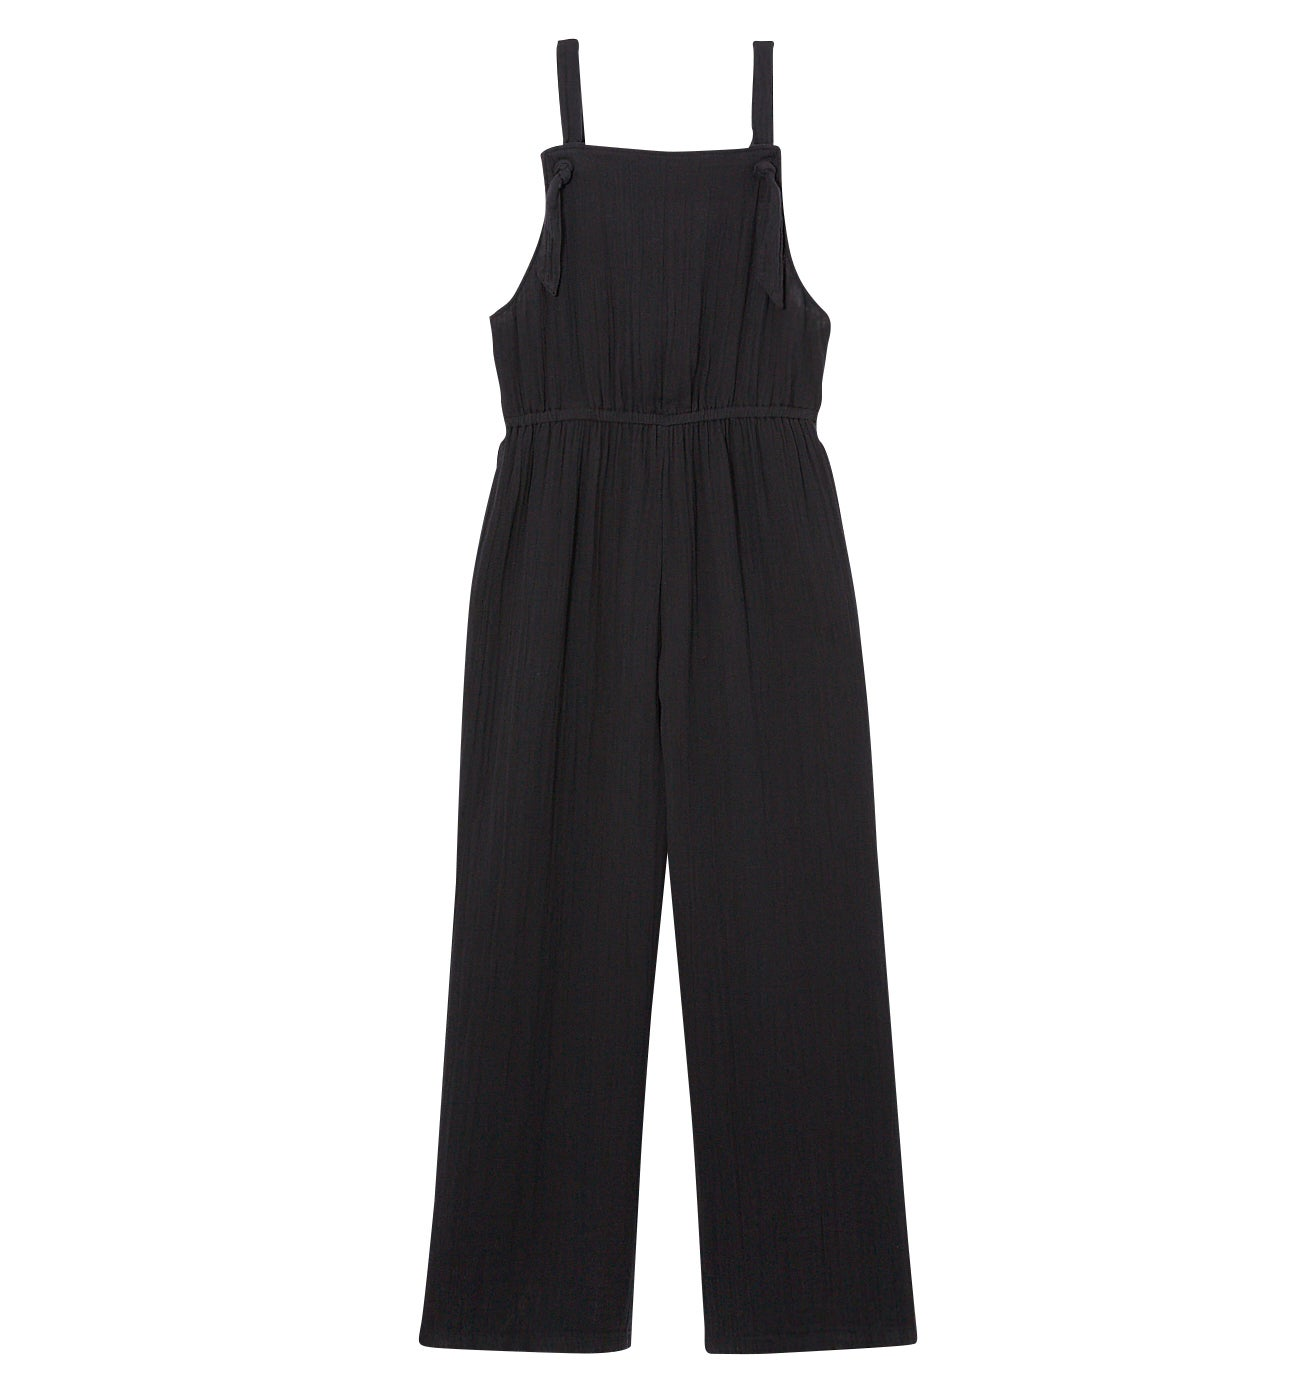 Combinaison-pantalon Femme